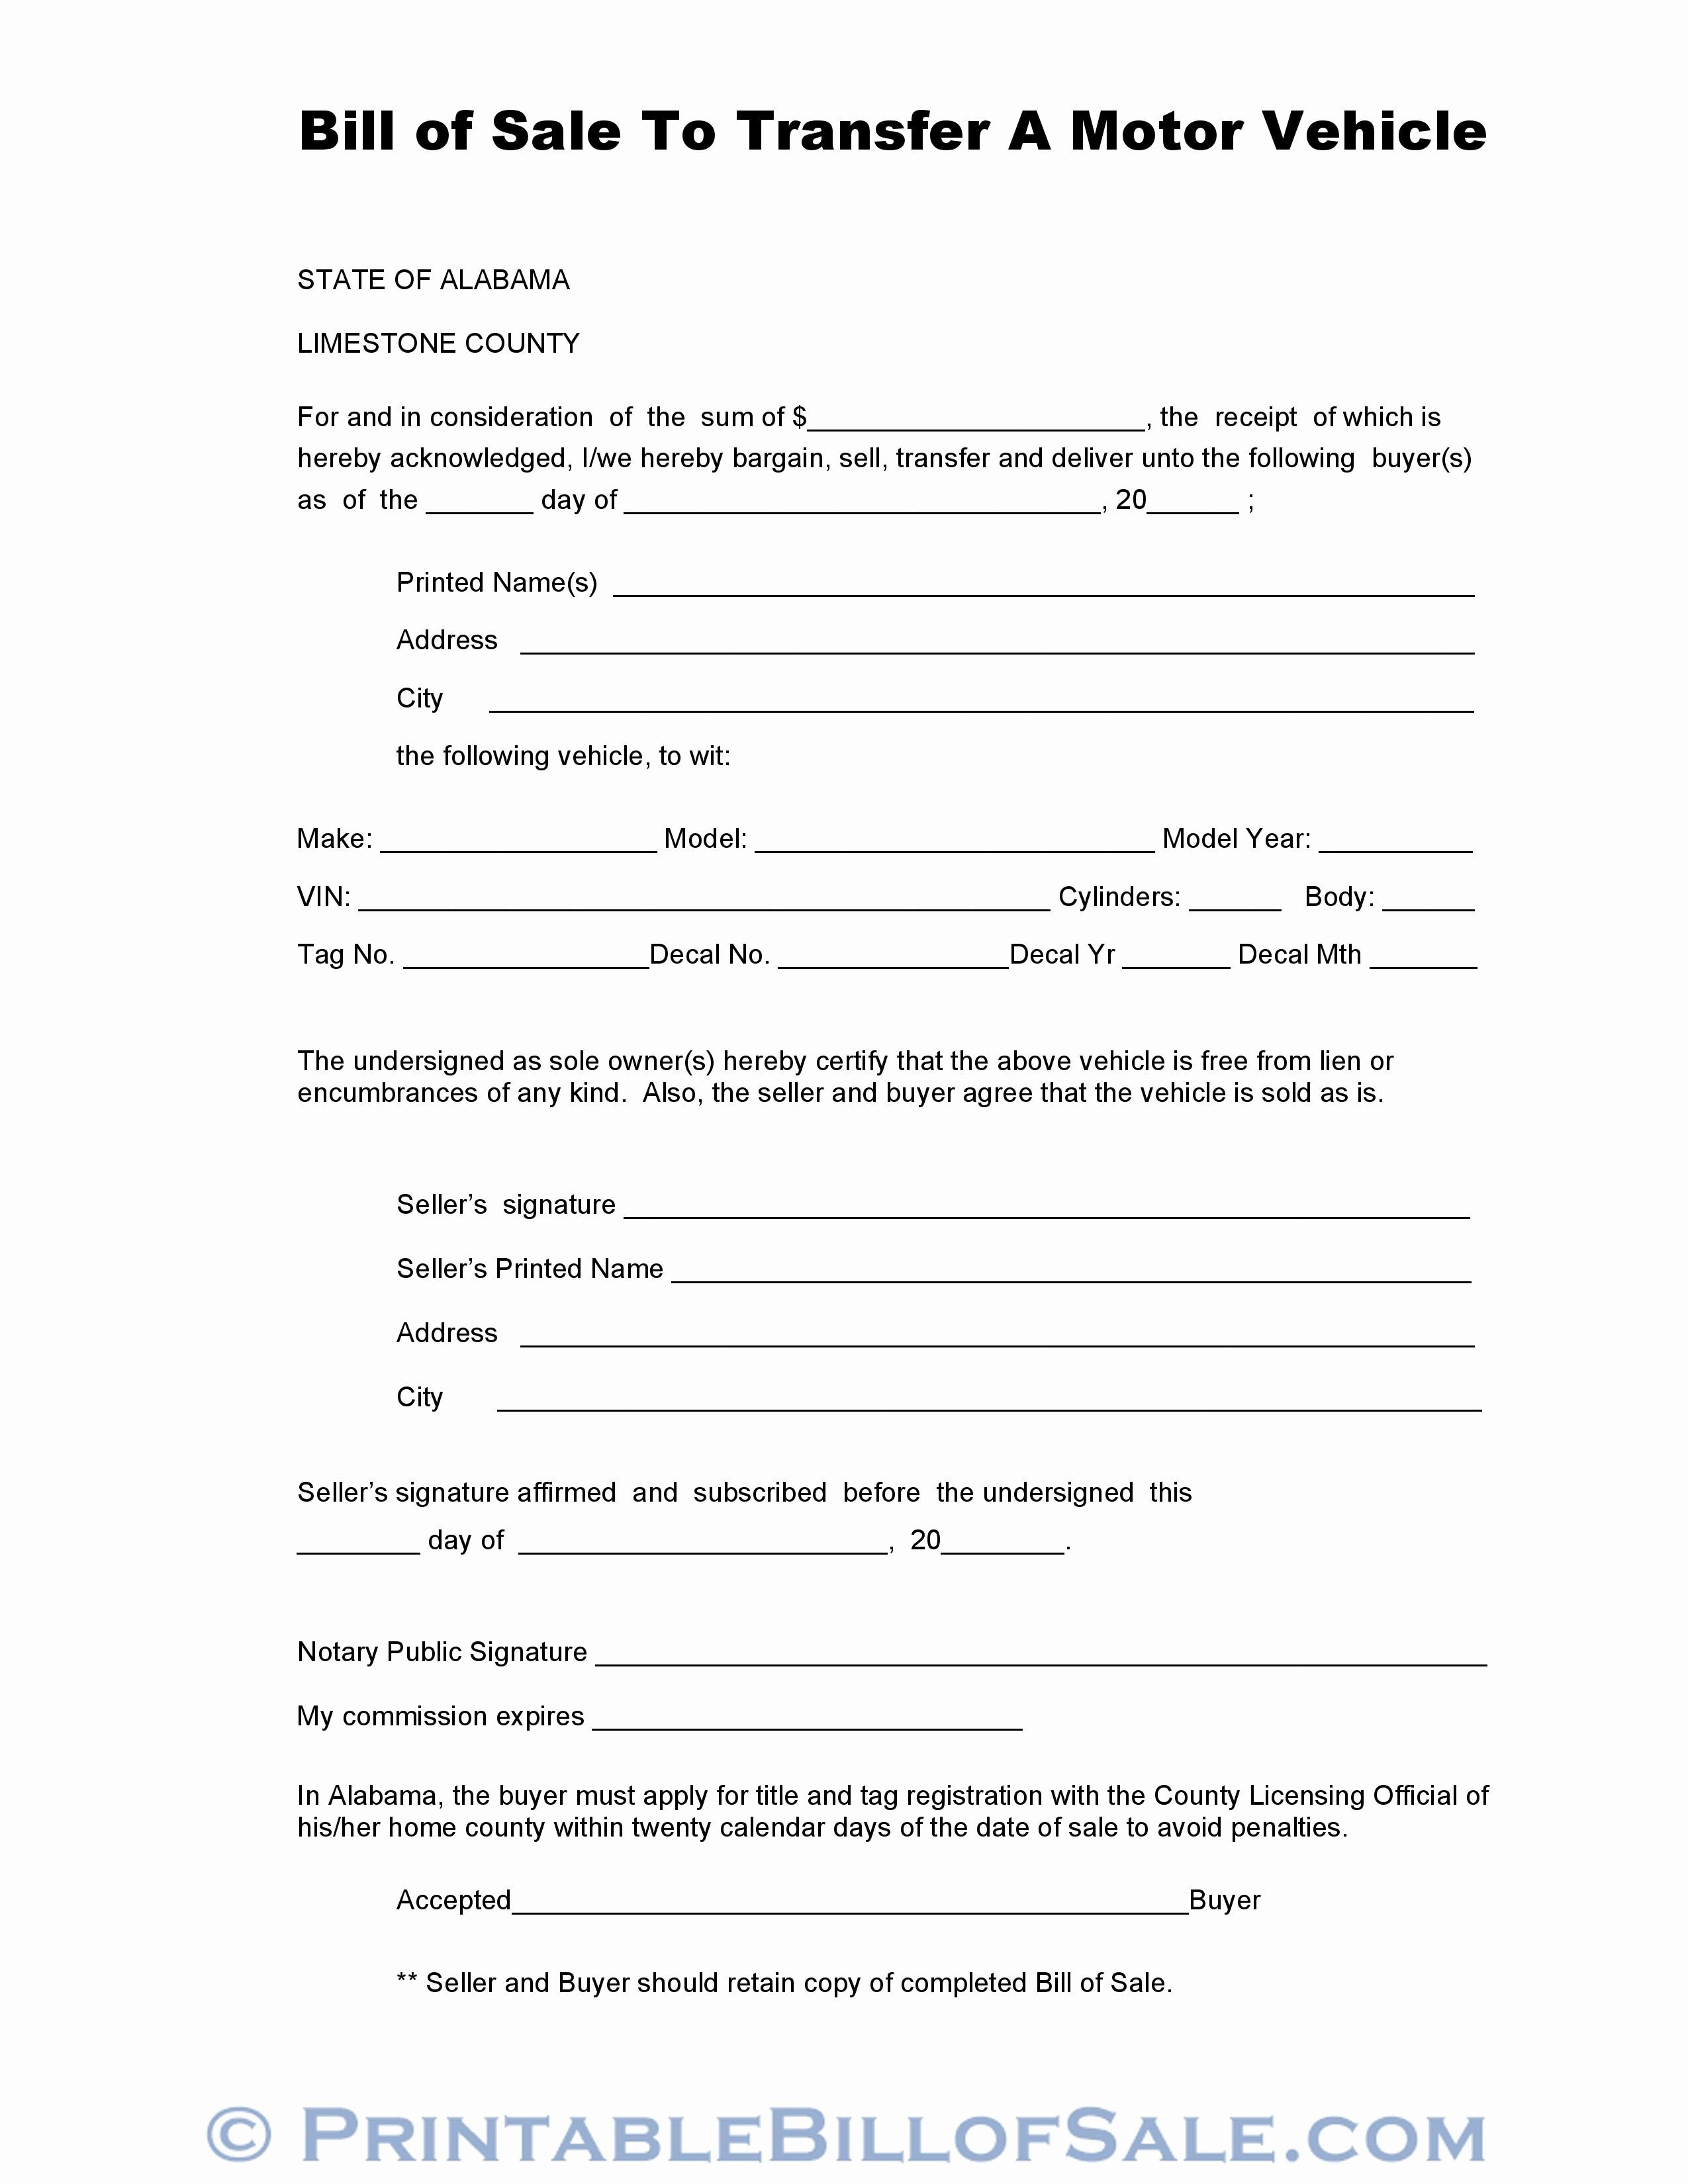 A Car Bill Of Sale Lovely Free Limestone County Alabama Vehicle Bill Of Sale form